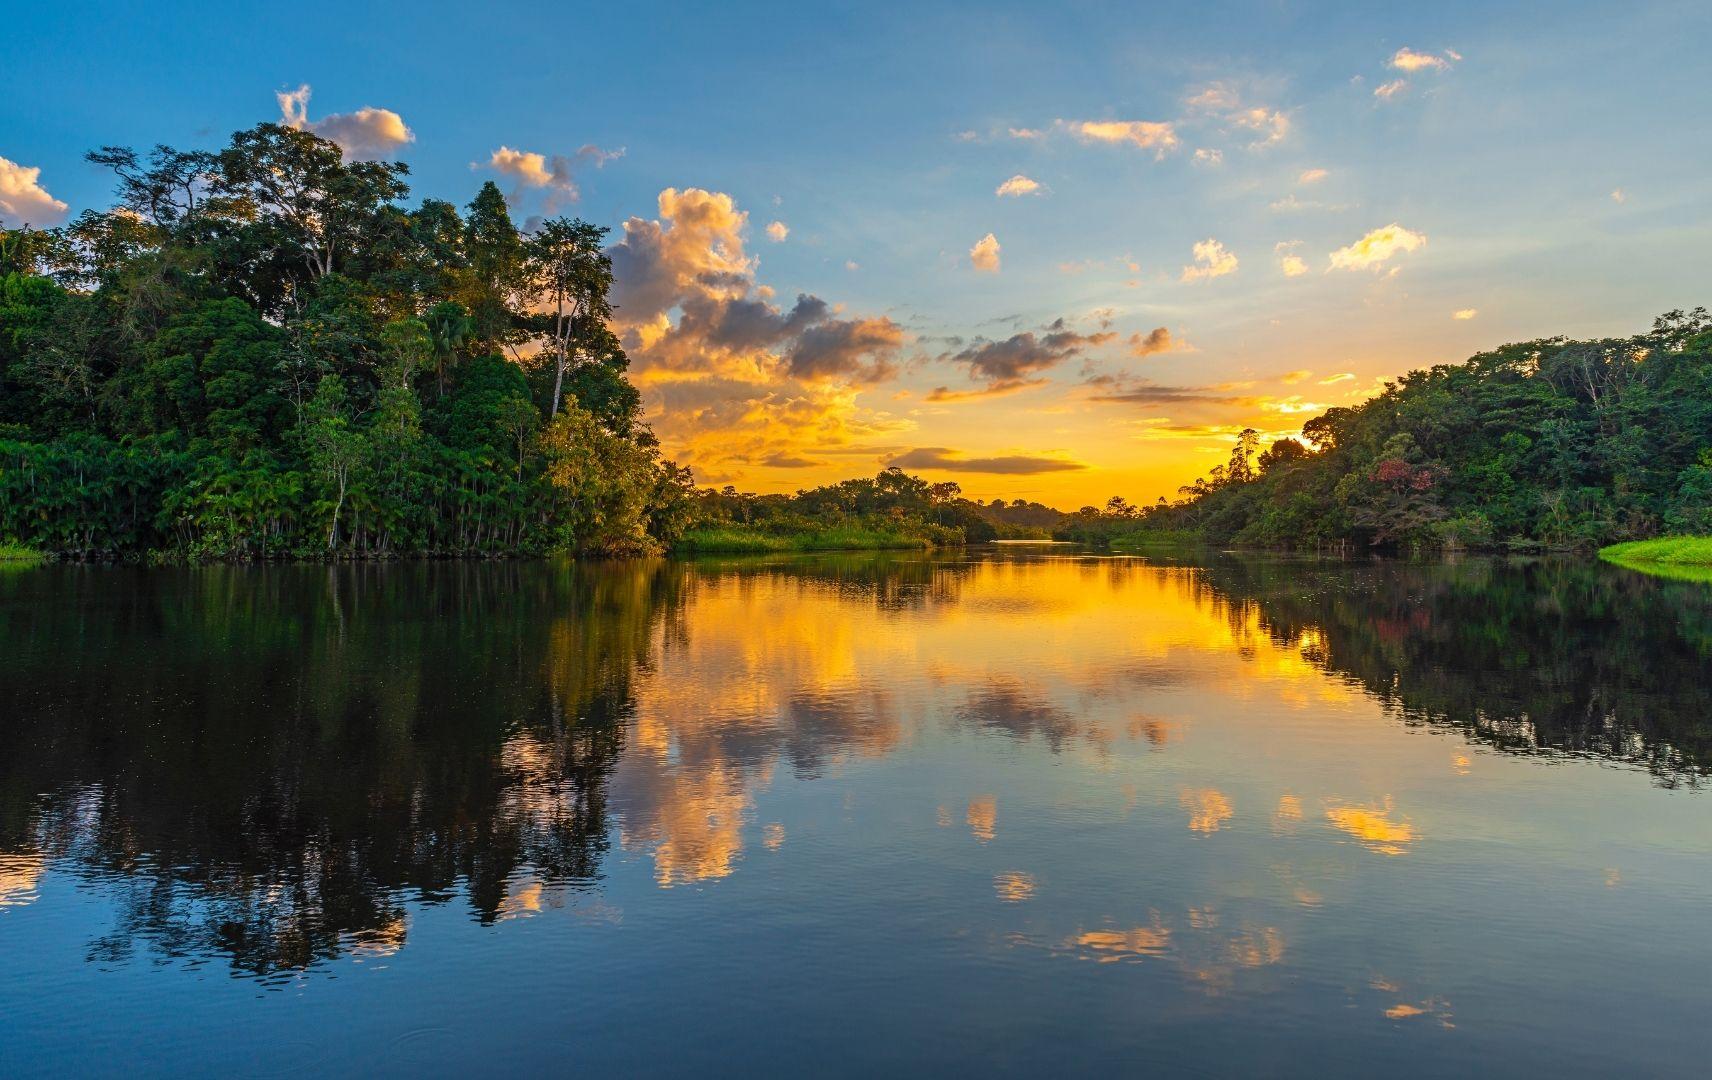 Kreuzfahrt top ten - Amazonas, Südamerika